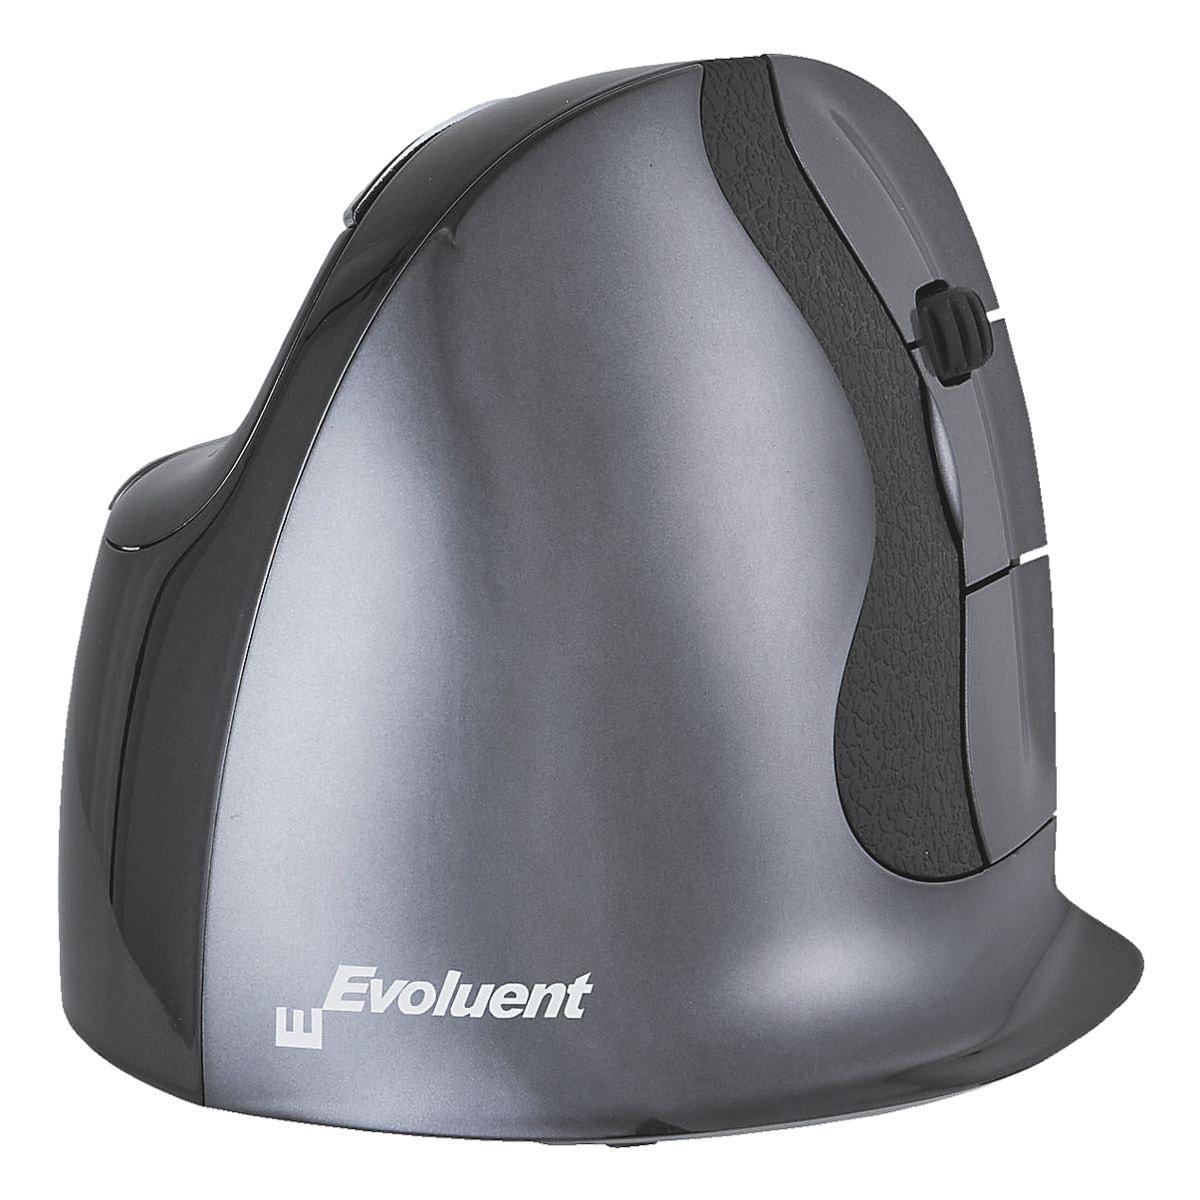 Evoluent Souris verticale « Evoluent D small Wireless »